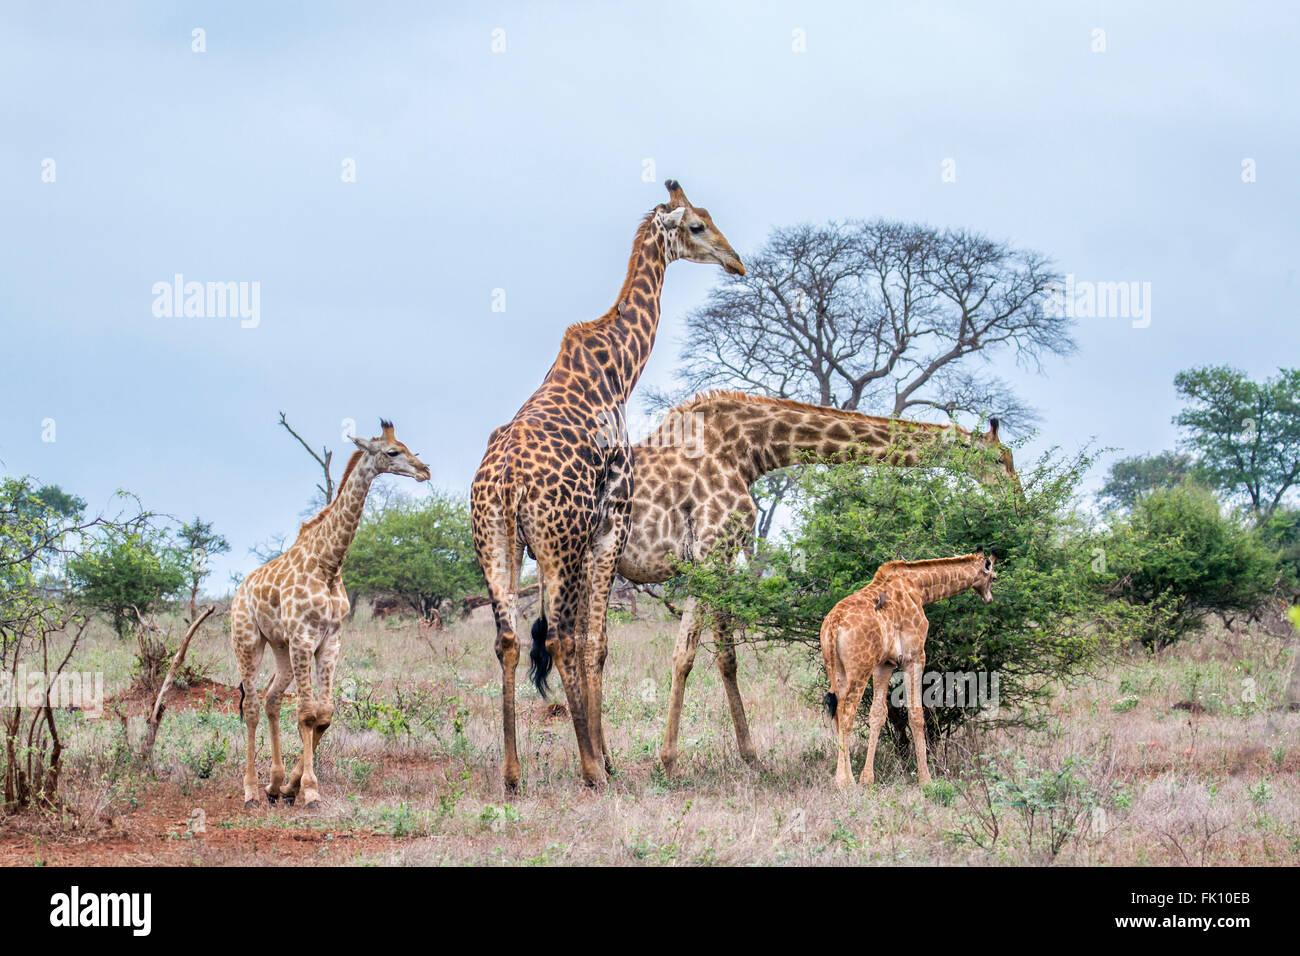 Especie de la familia jirafa Giraffa camelopardalis familia Giraffidae, el Parque Nacional Kruger, Sudáfrica Imagen De Stock